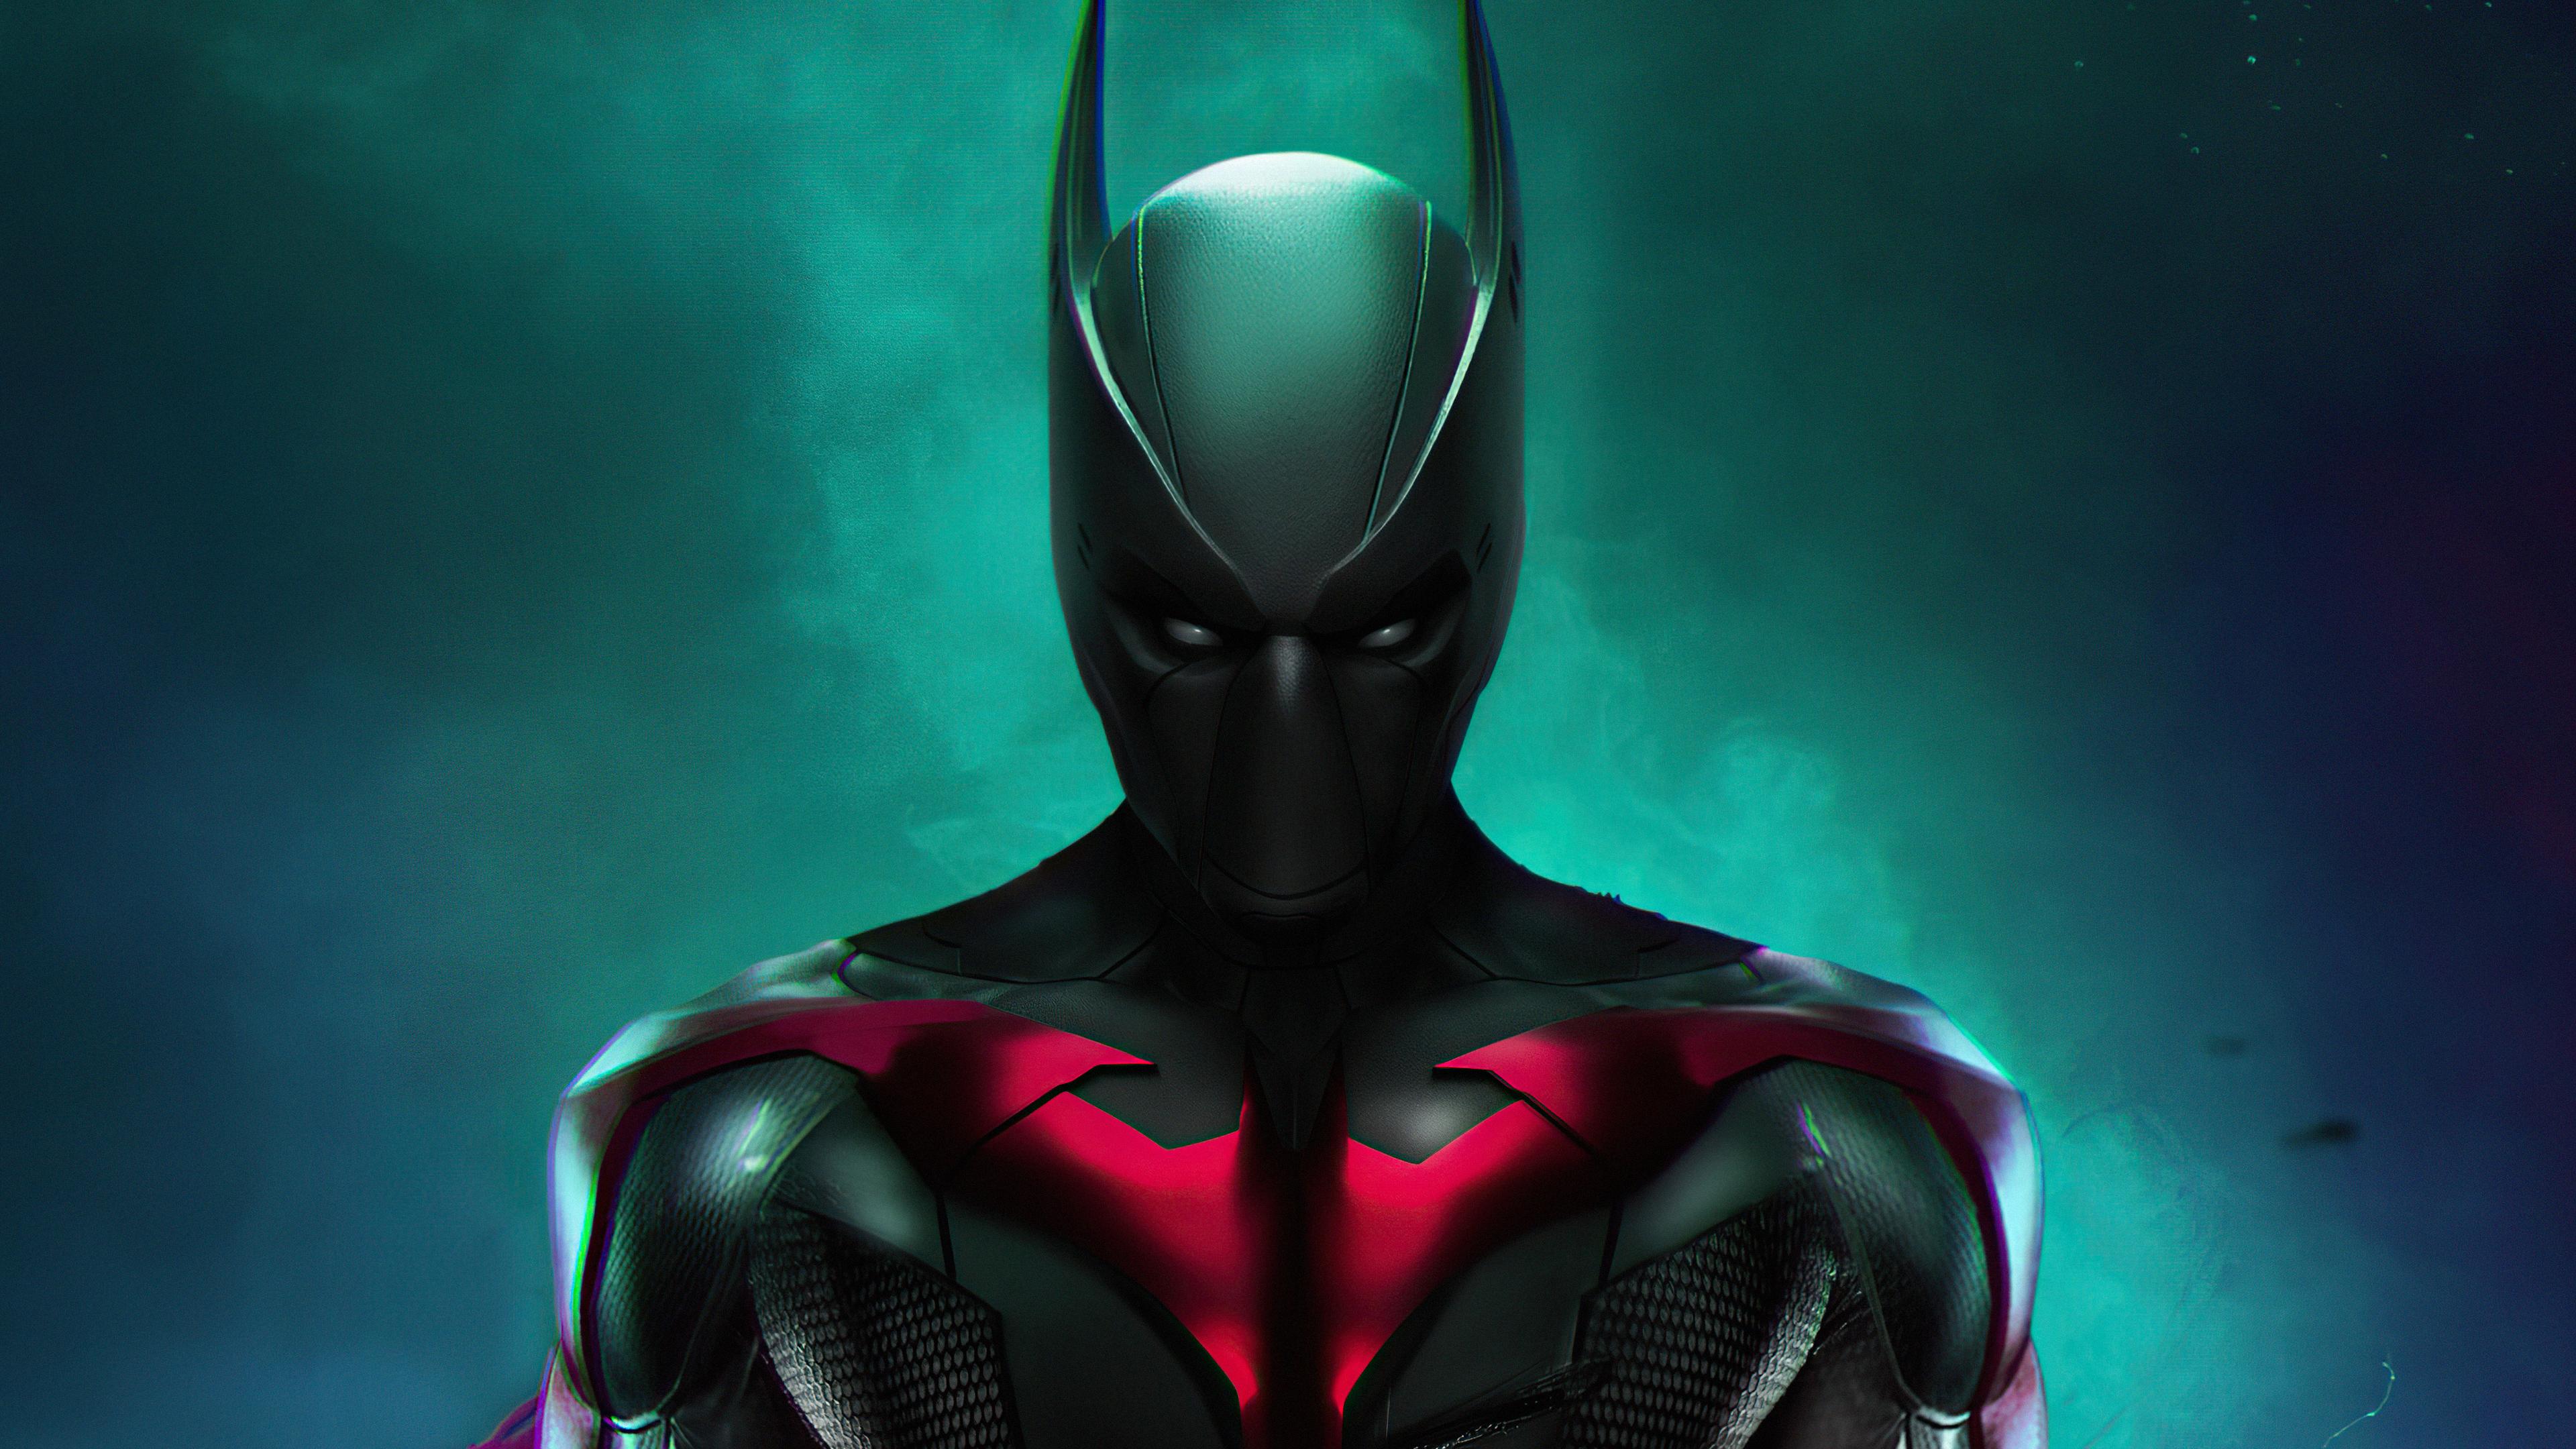 stranger batman beyond 4k 1616957339 - Stranger Batman Beyond 4k - Stranger Batman Beyond 4k wallpapers